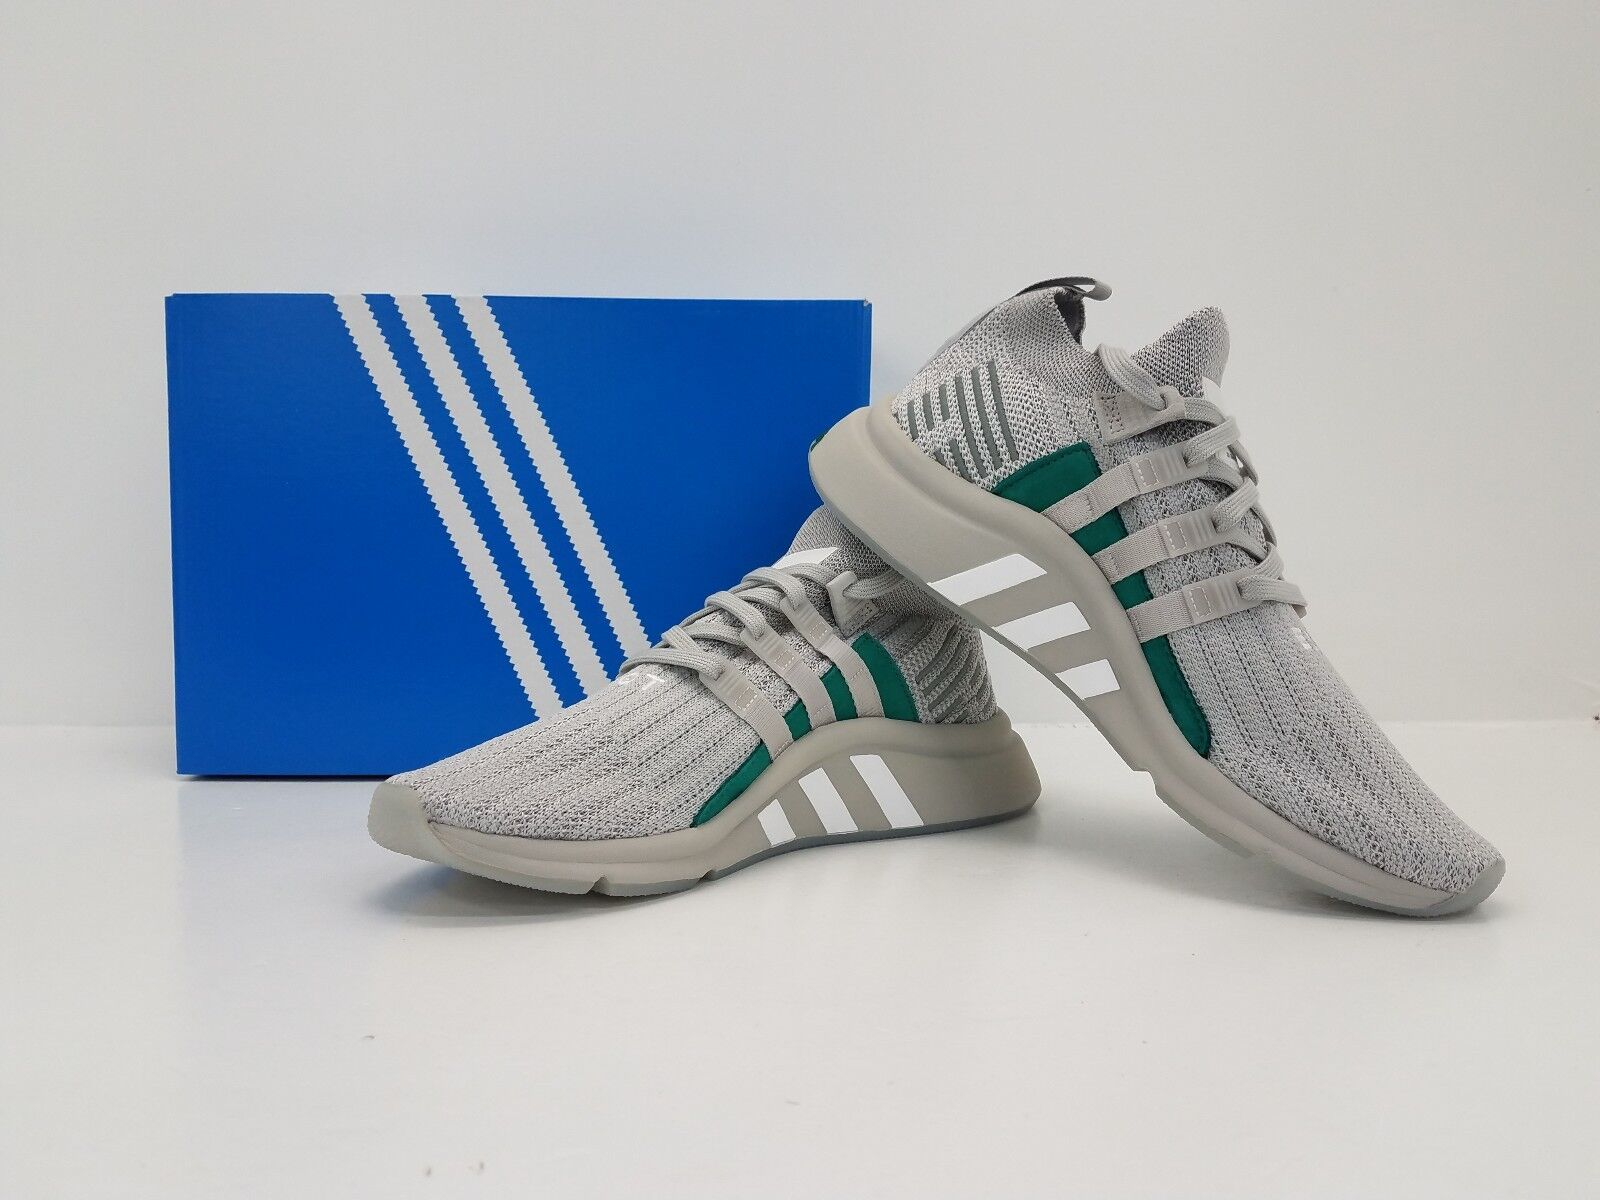 Adidas Originals EQT Support Mid ADV PK Grey/Silver B37372 - BRAND NEW IN BOX!!